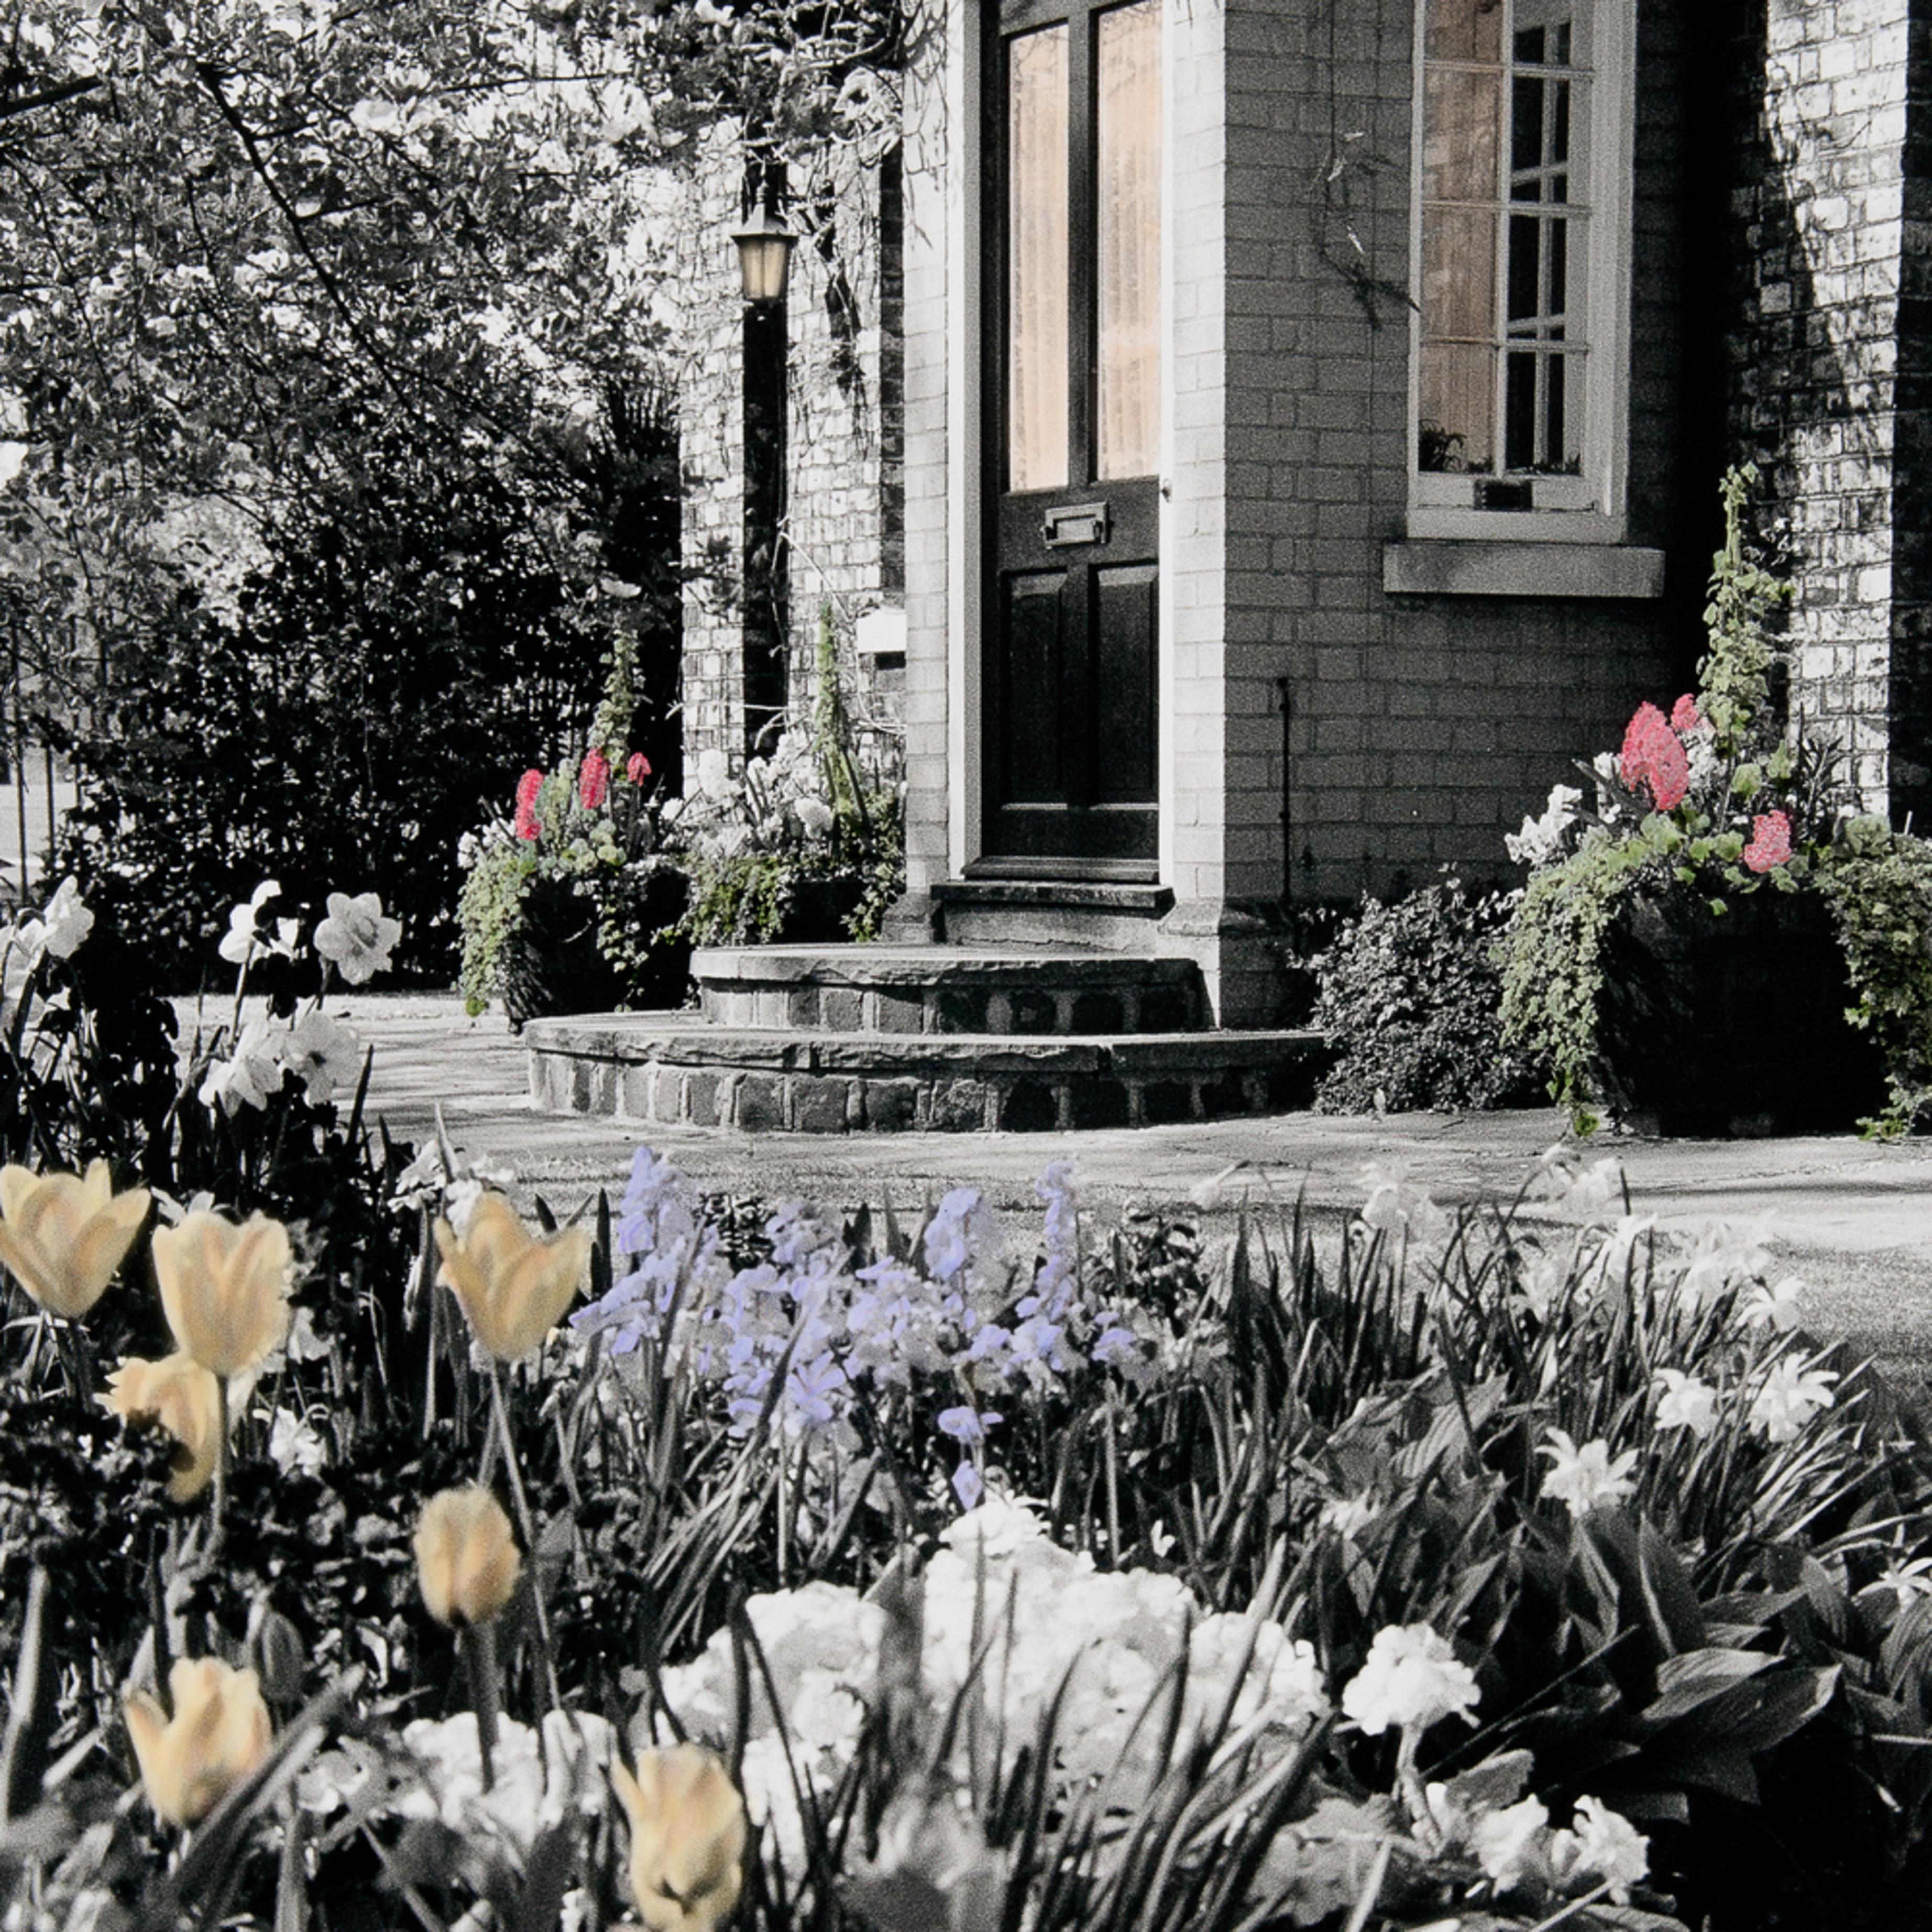 Gardener s home london 8.10 zou0rl